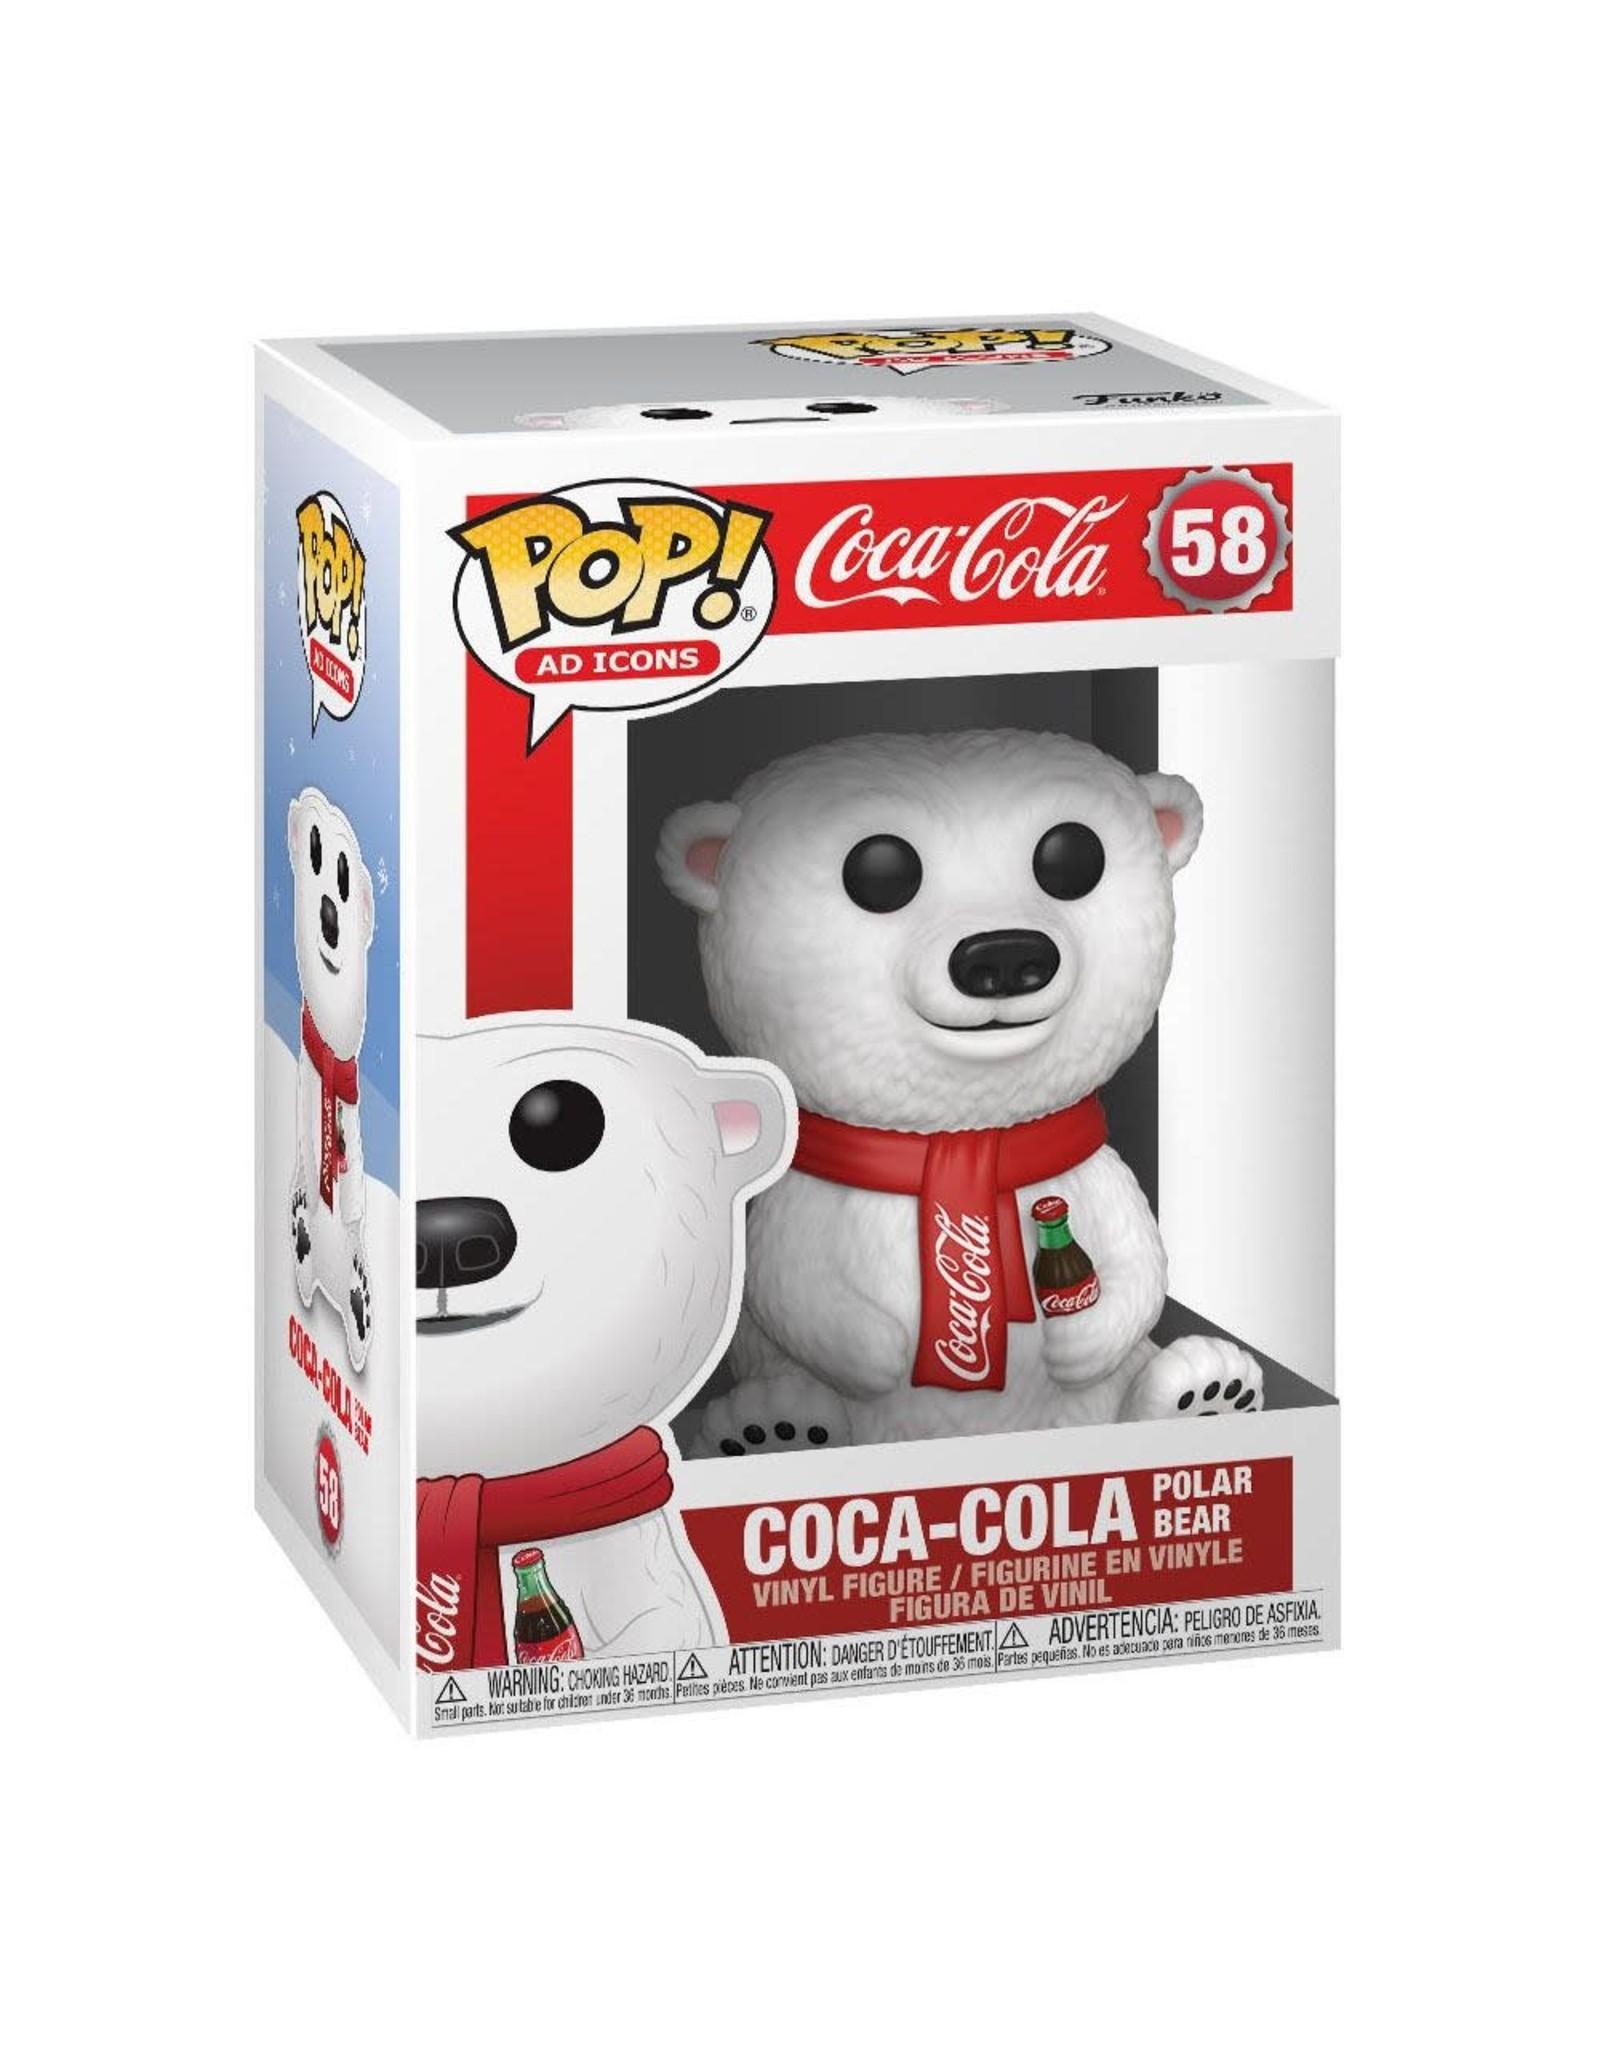 Coca-Cola - Polar Bear - Funko Pop! Ad Icons 58